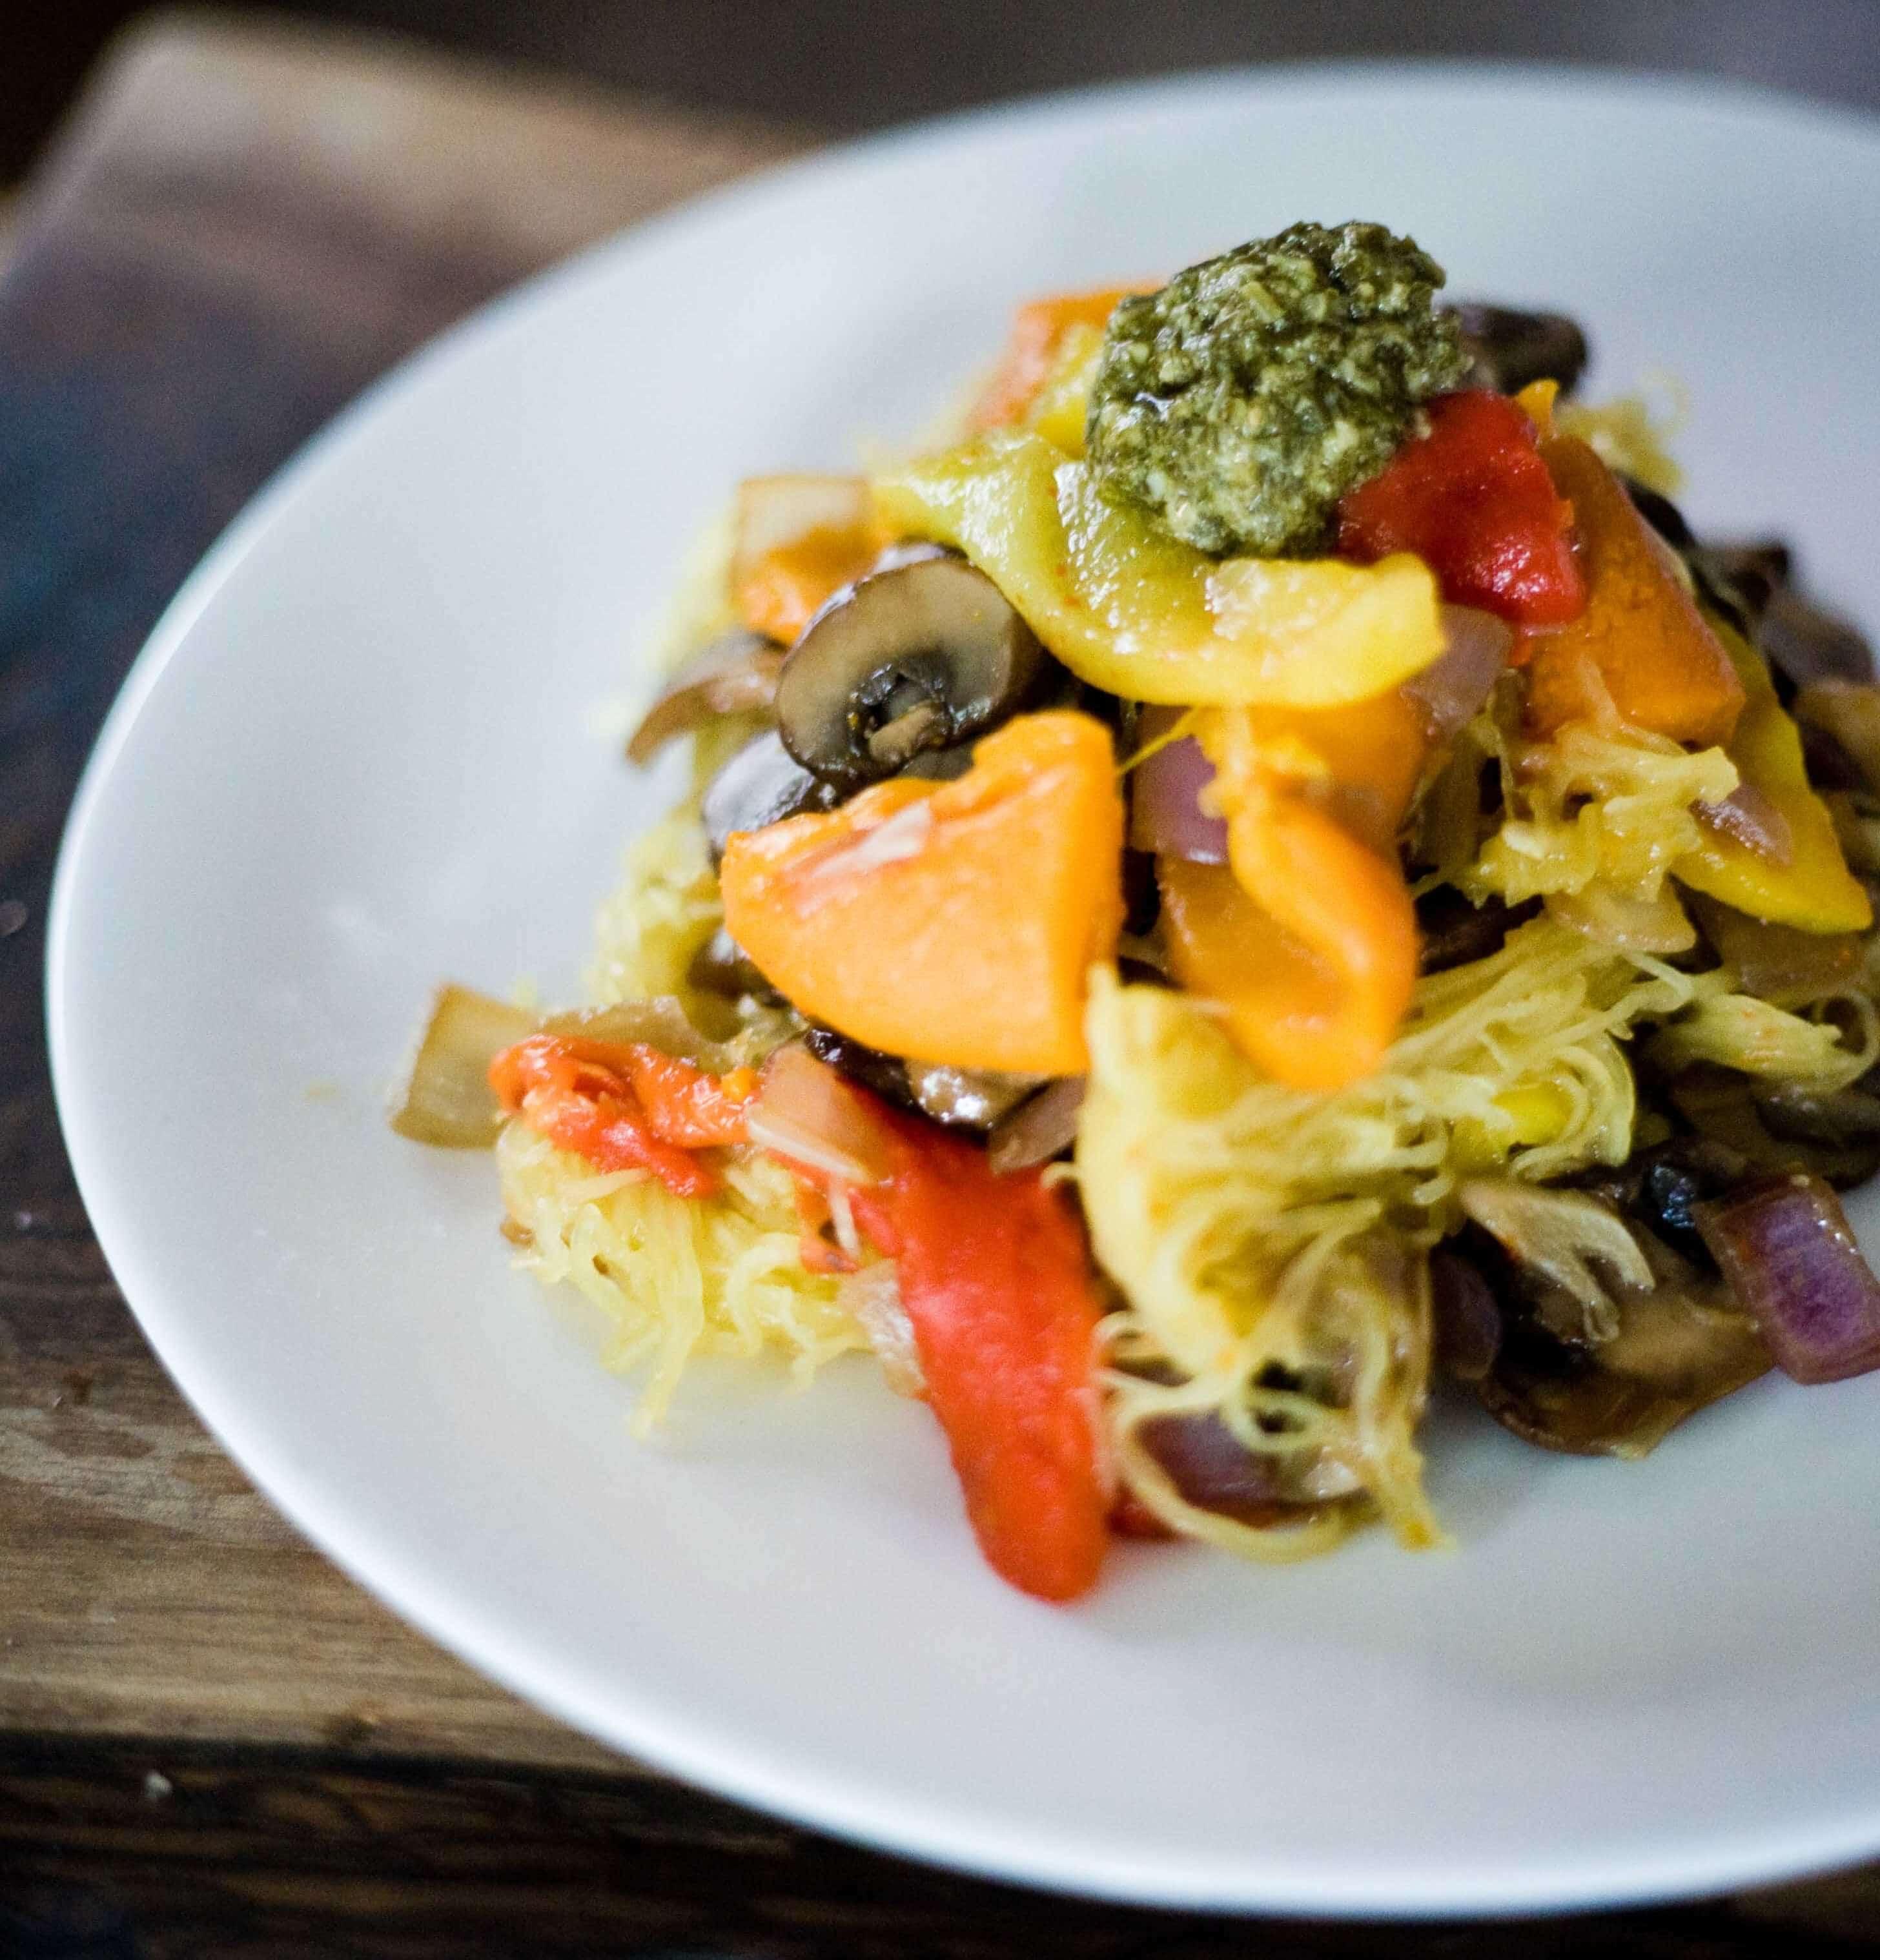 Spaghetti Squash with Pesto, Mushrooms and Roasted Peppers Recipe